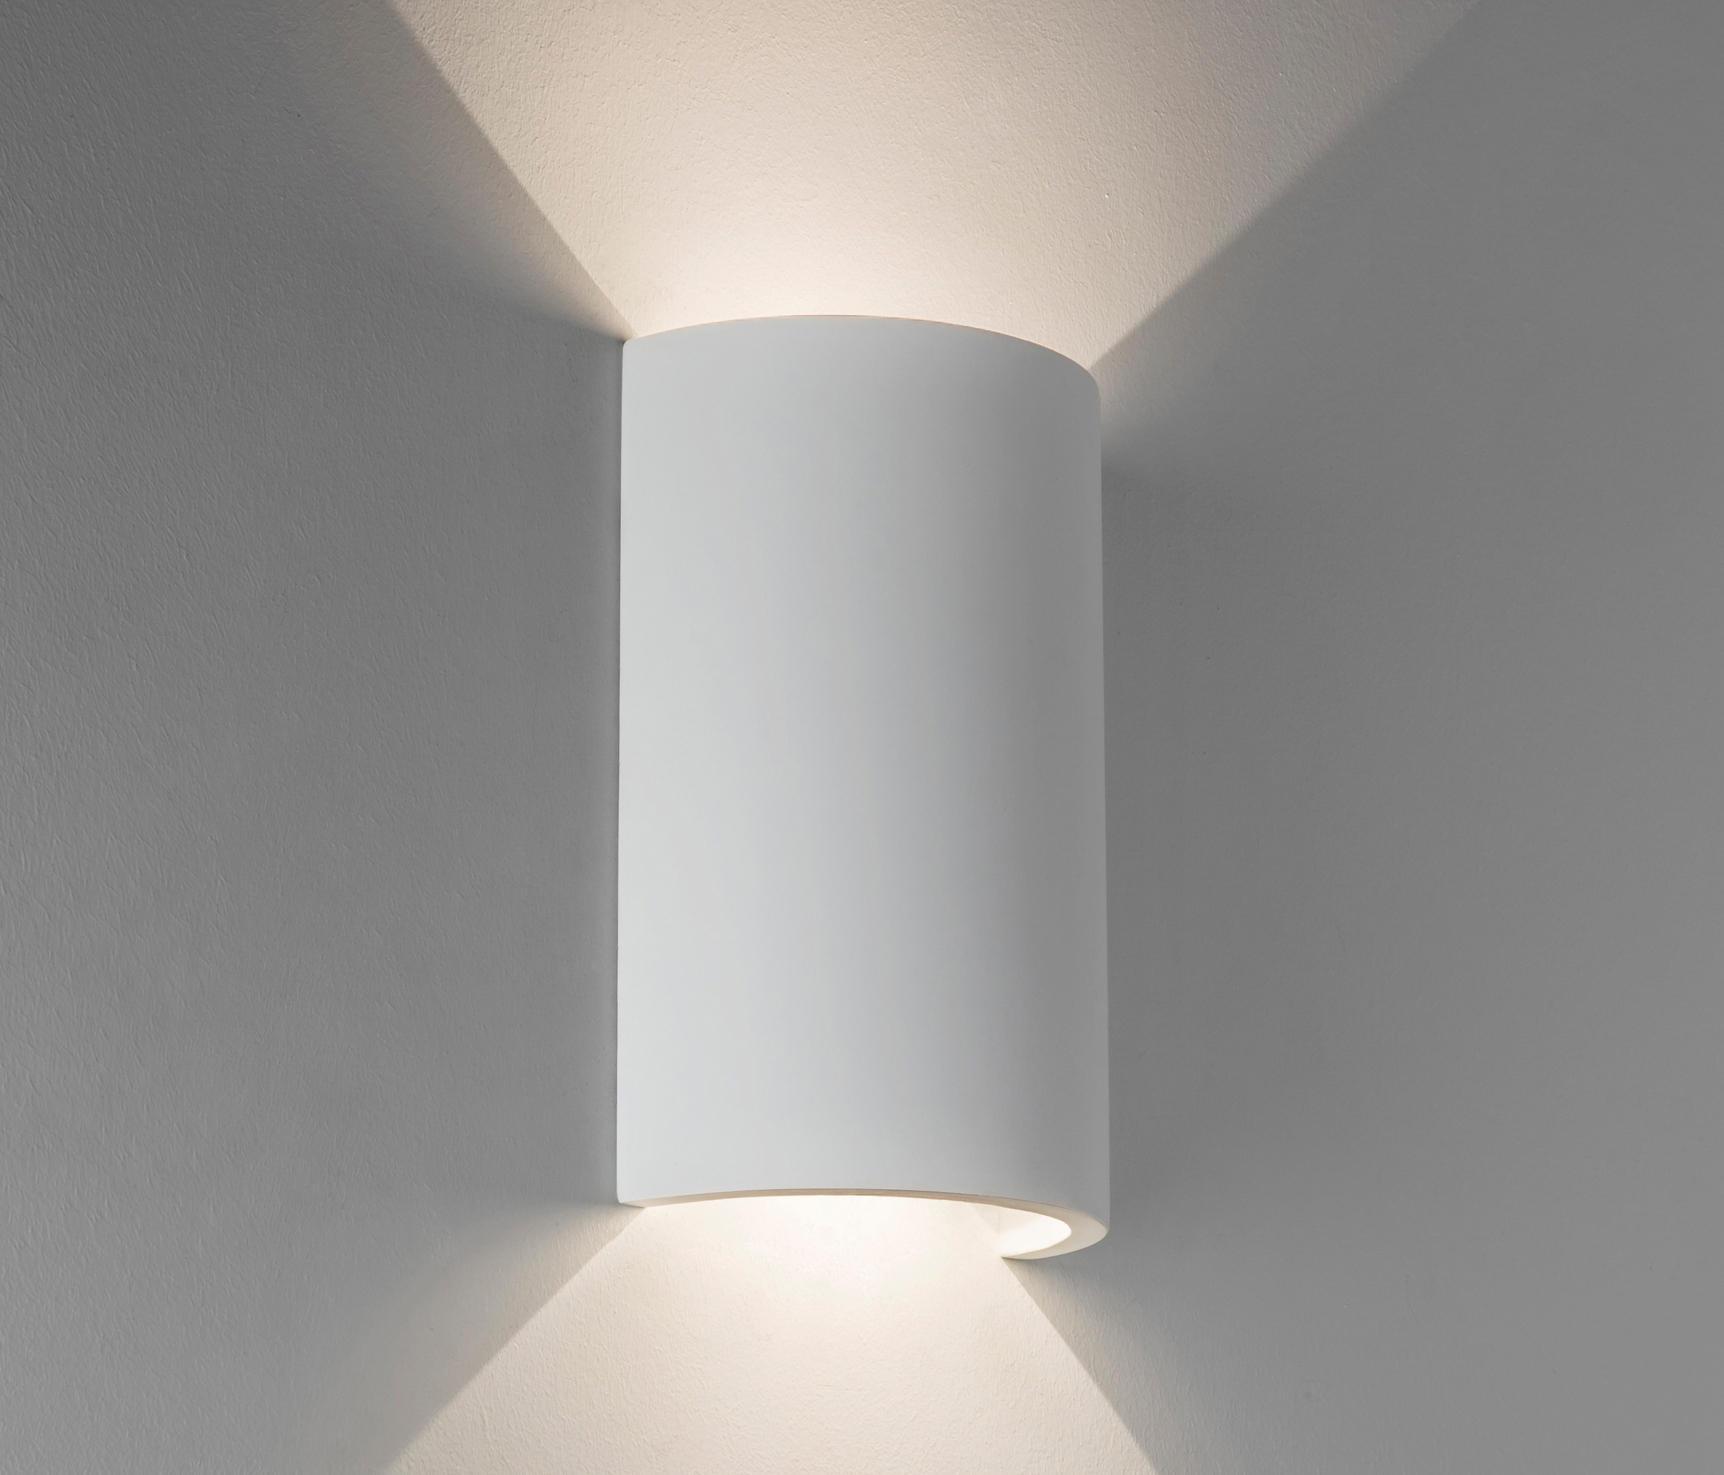 serifos 170 led general lighting from astro lighting. Black Bedroom Furniture Sets. Home Design Ideas